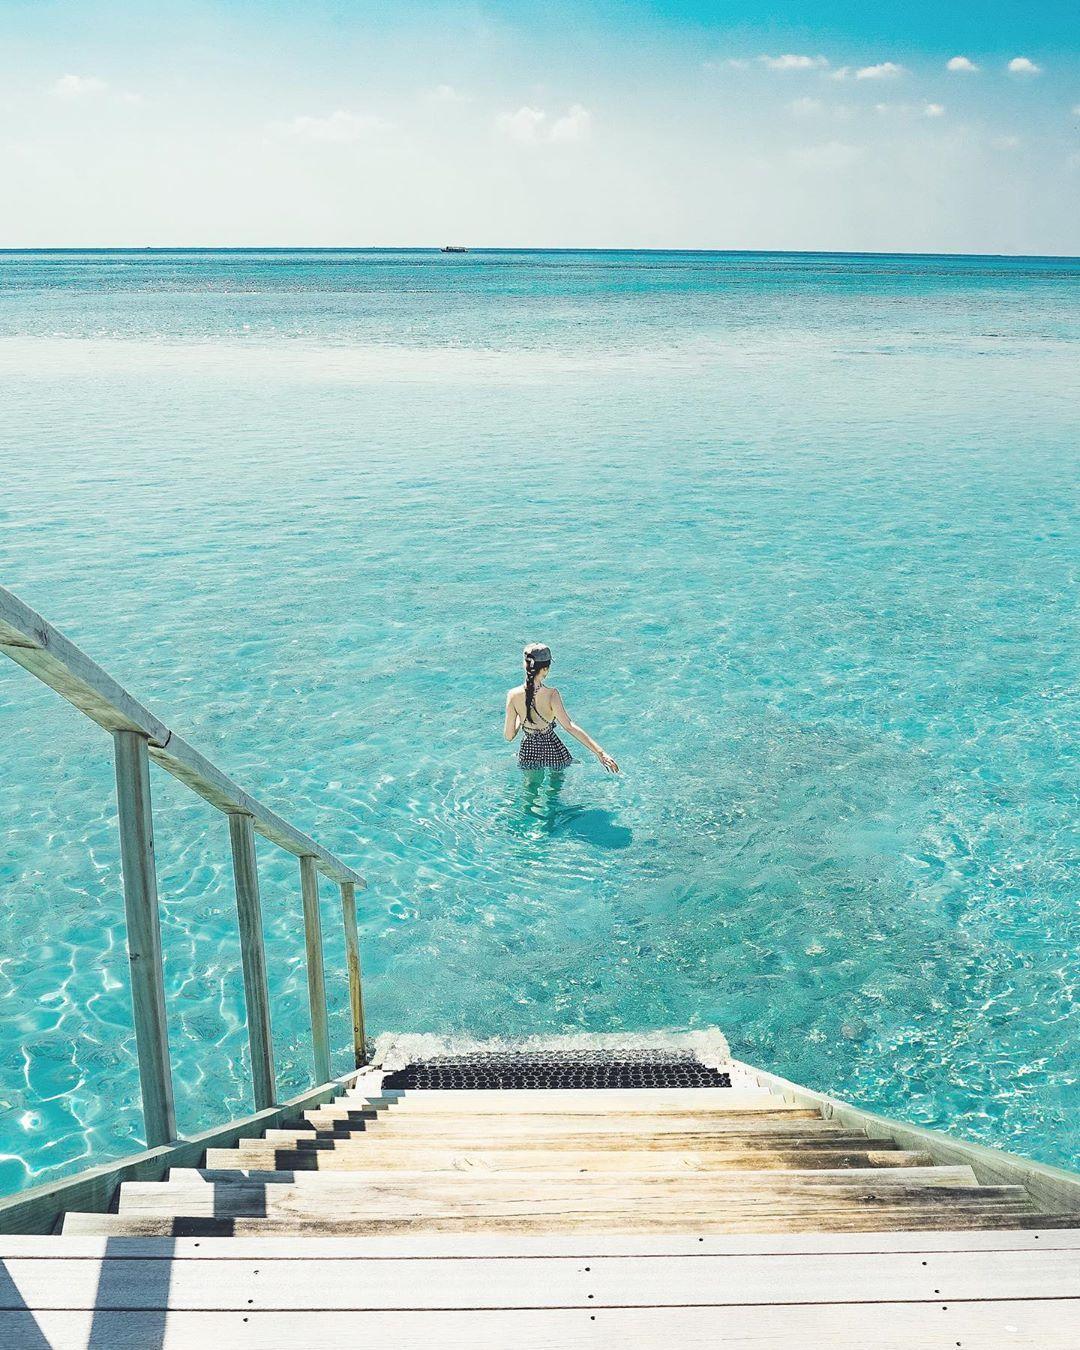 Hikari 加藤 光 On Instagram 暑過ぎてこんな海に飛び込みたい 朝目が覚めてすぐ部屋から続く階段を降りて海に飛び込んだこの部屋が忘れられない 連載中の雑誌hanako Hanako Magazin Outdoor Trip Outdoor Decor